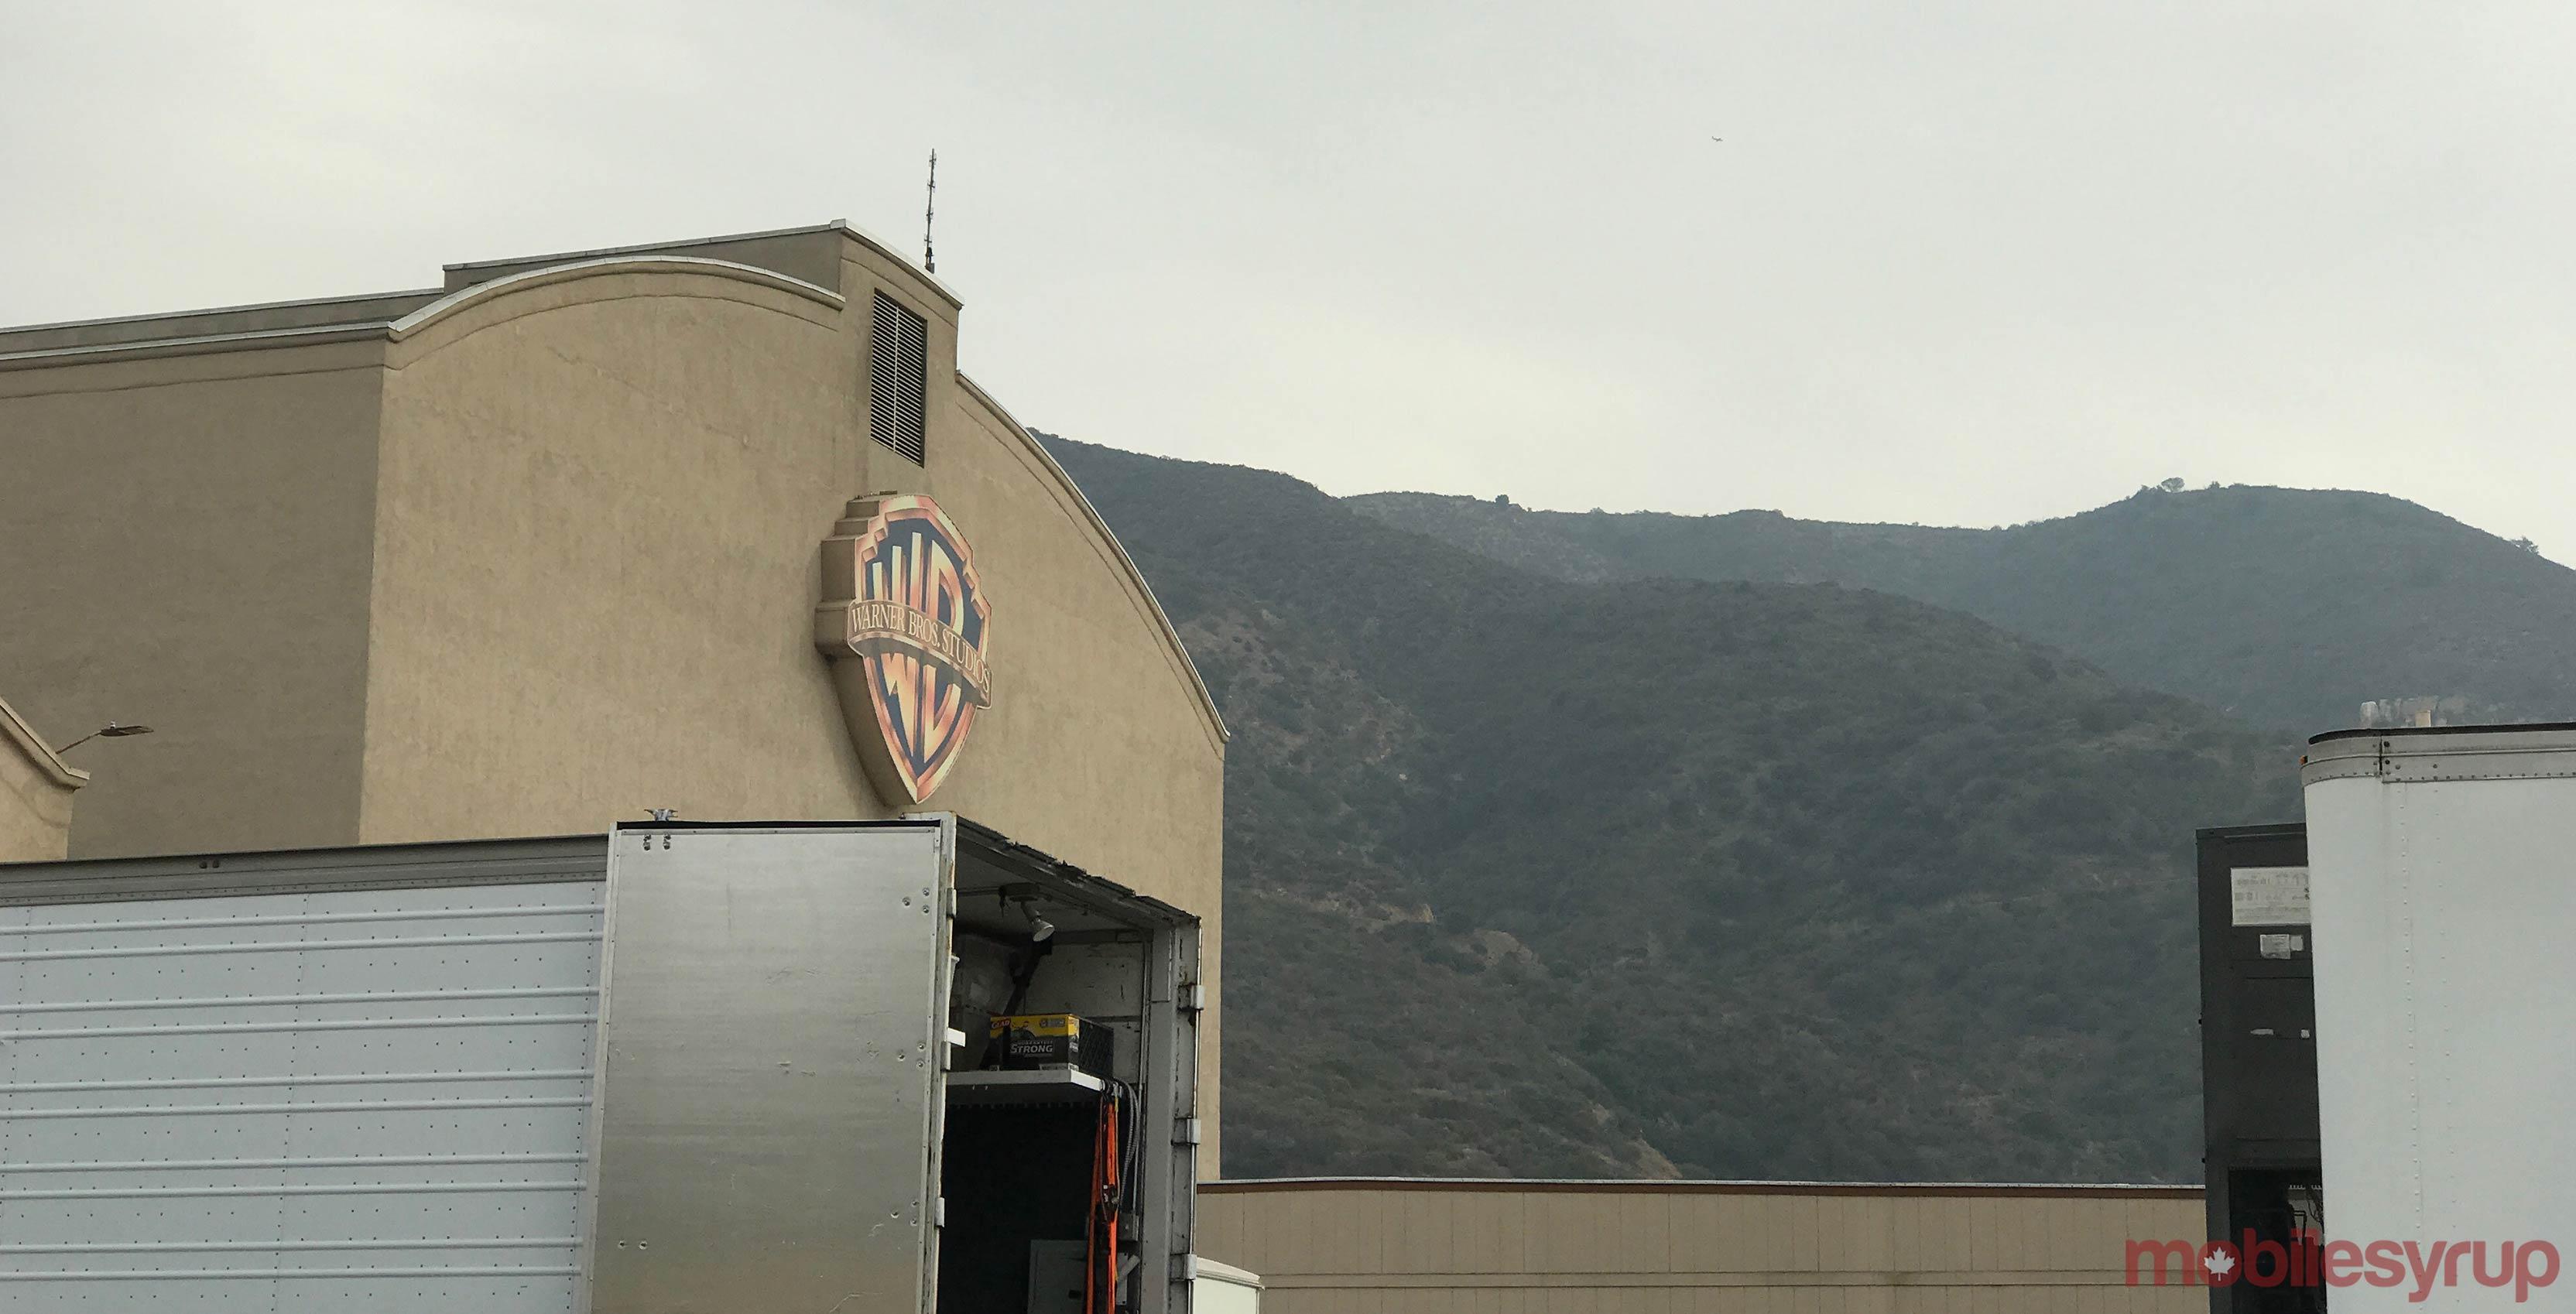 Warner Bros. Entertainment studio